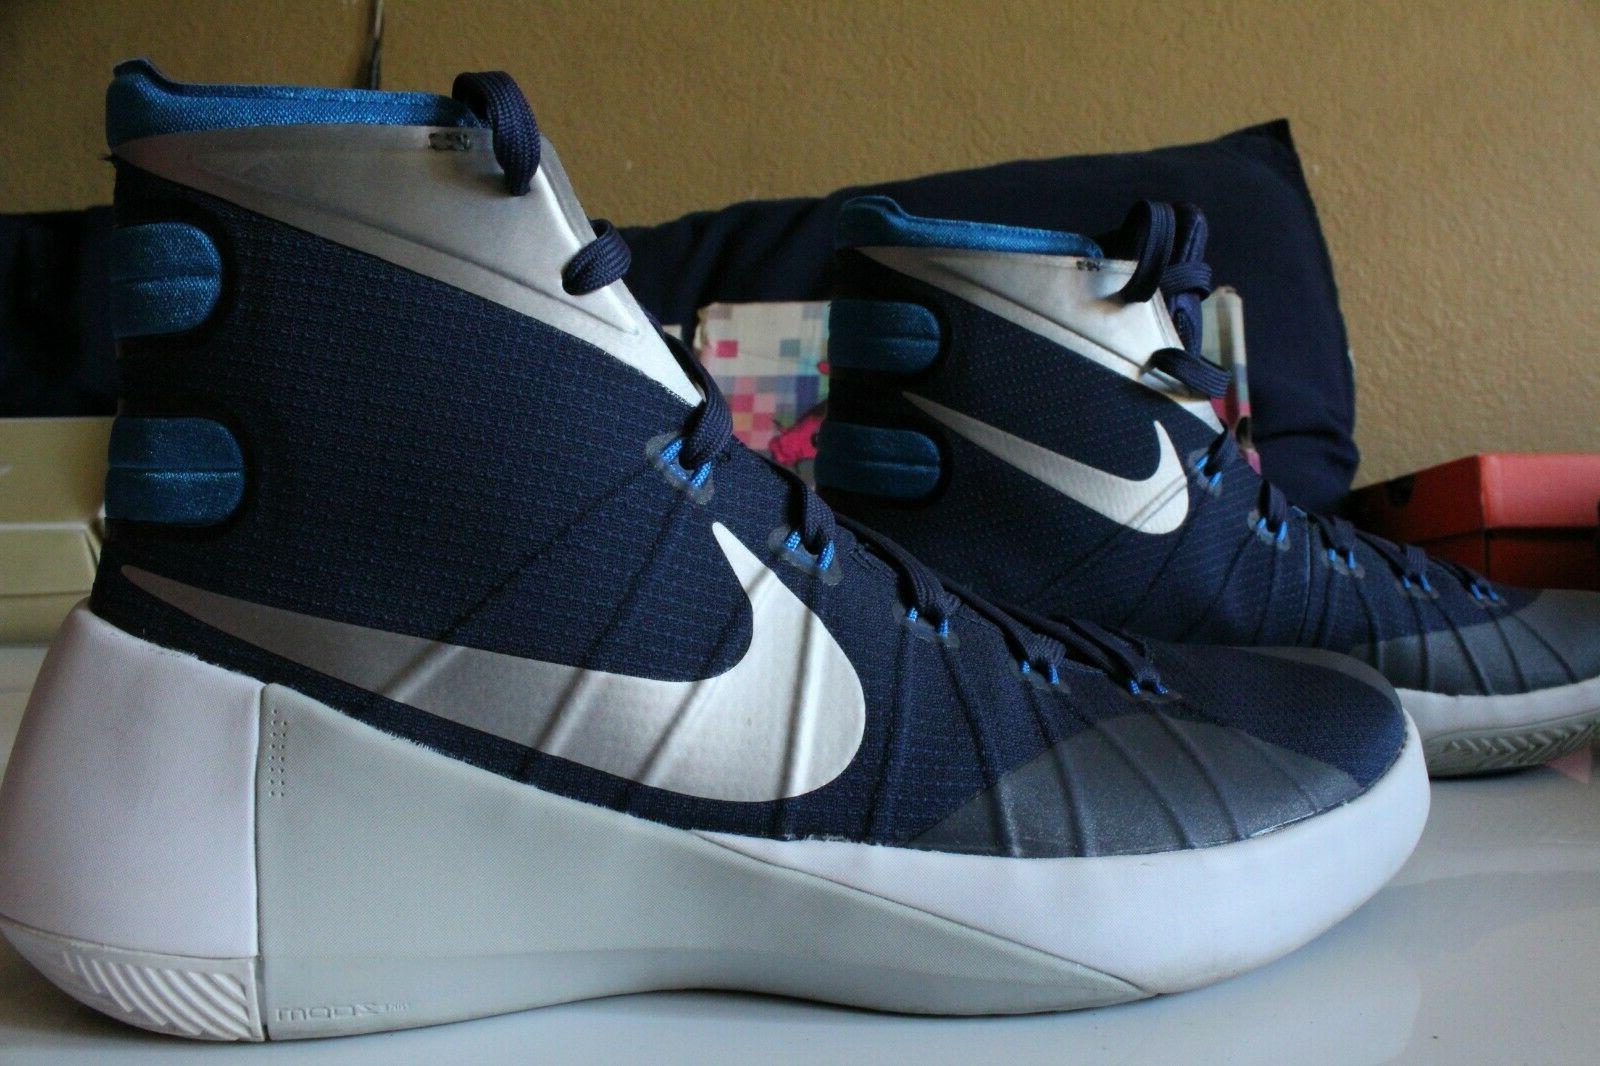 Nike Basketball Shoes White 749645-405